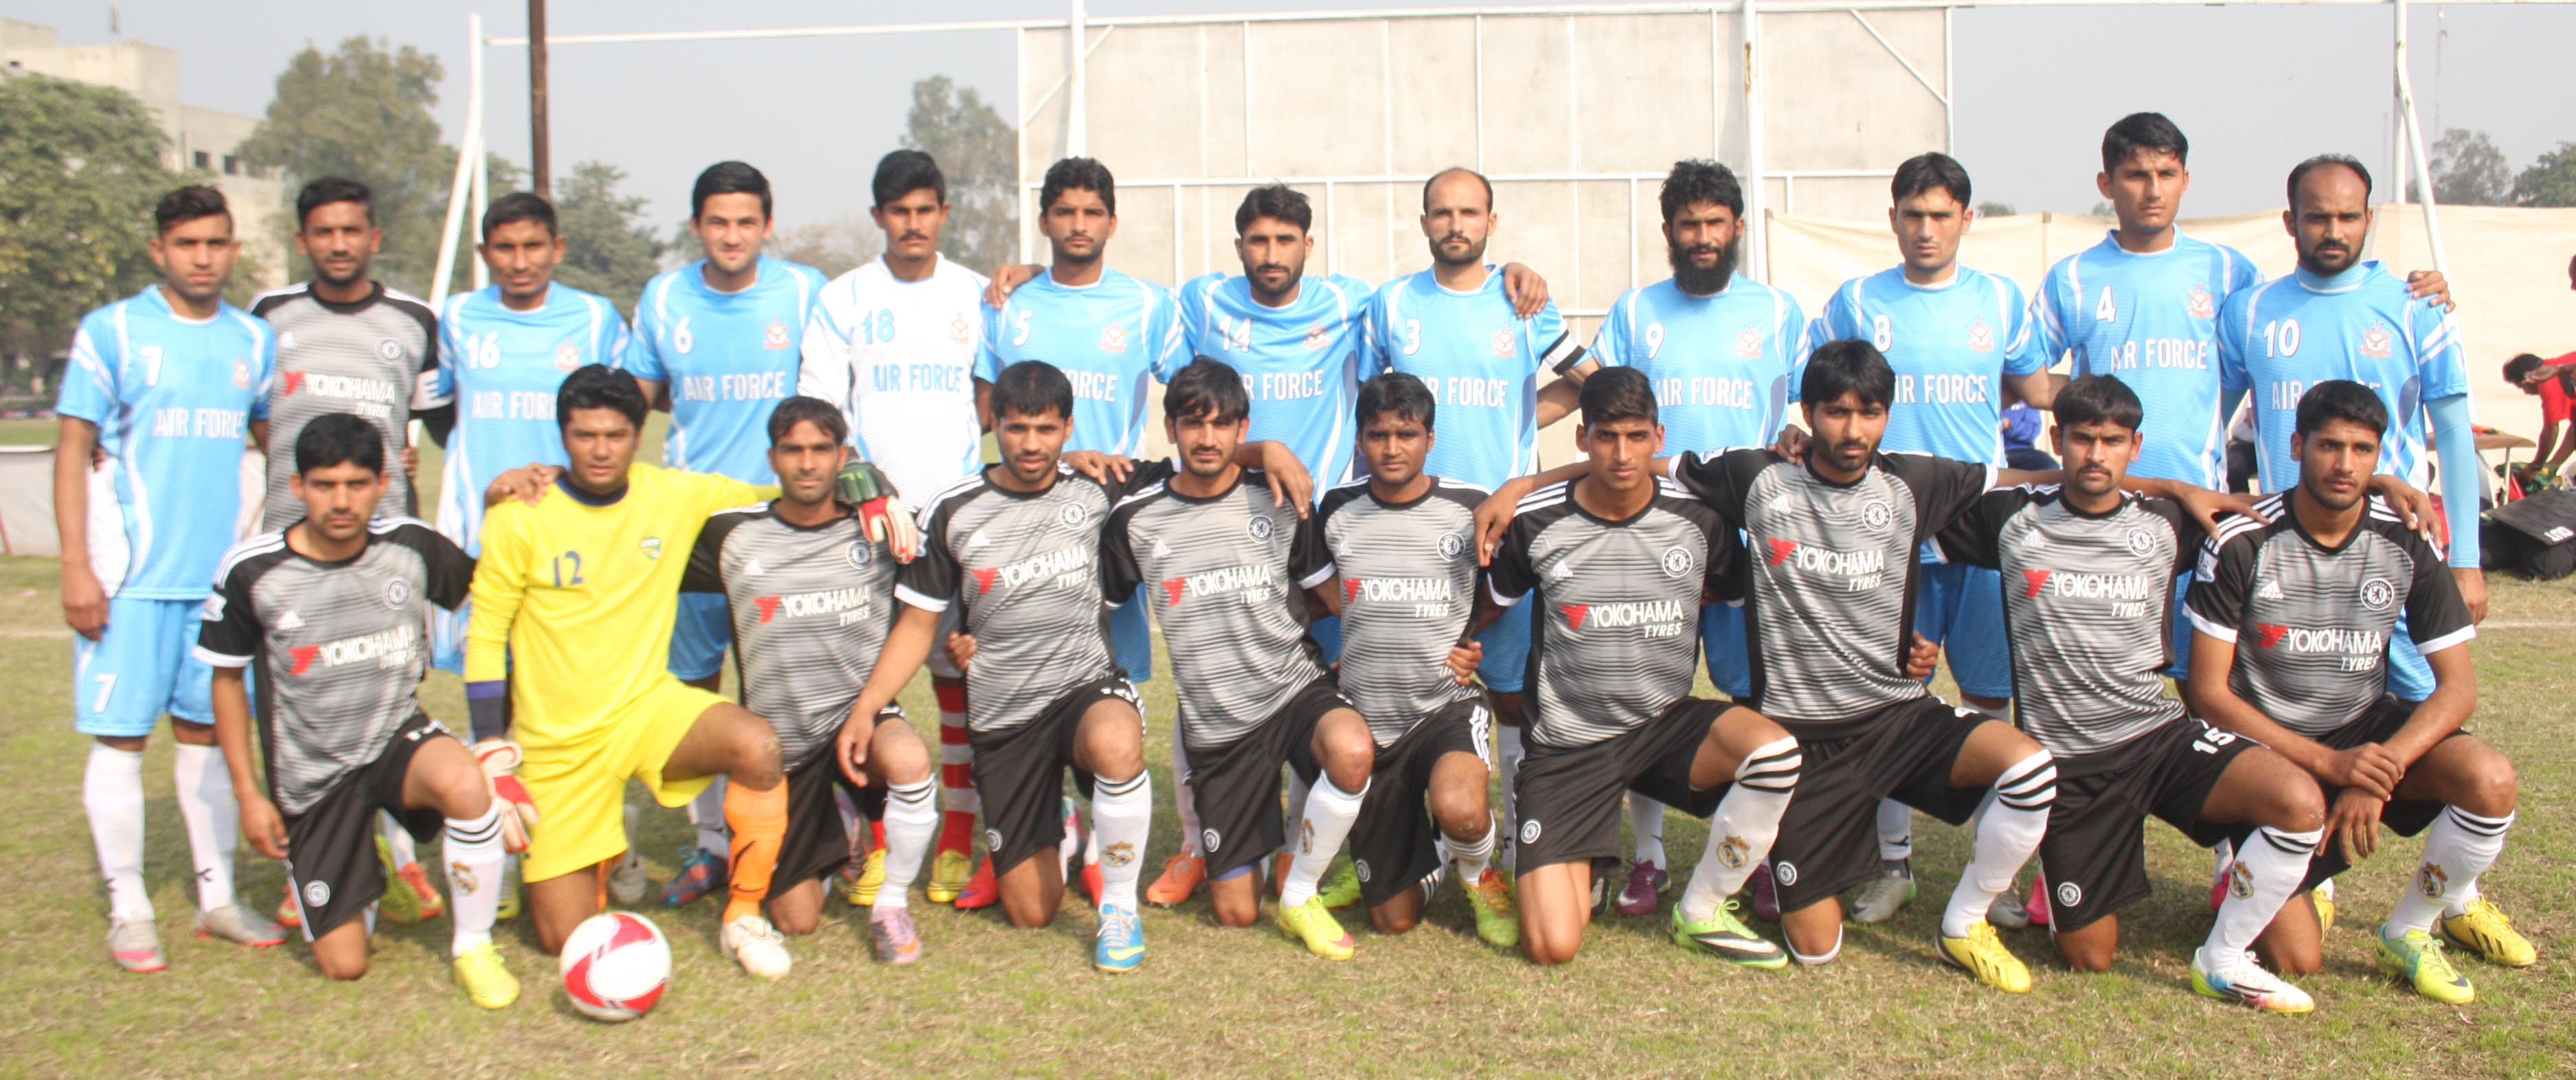 PAF vs Bhatti United - PFF Cup 2016